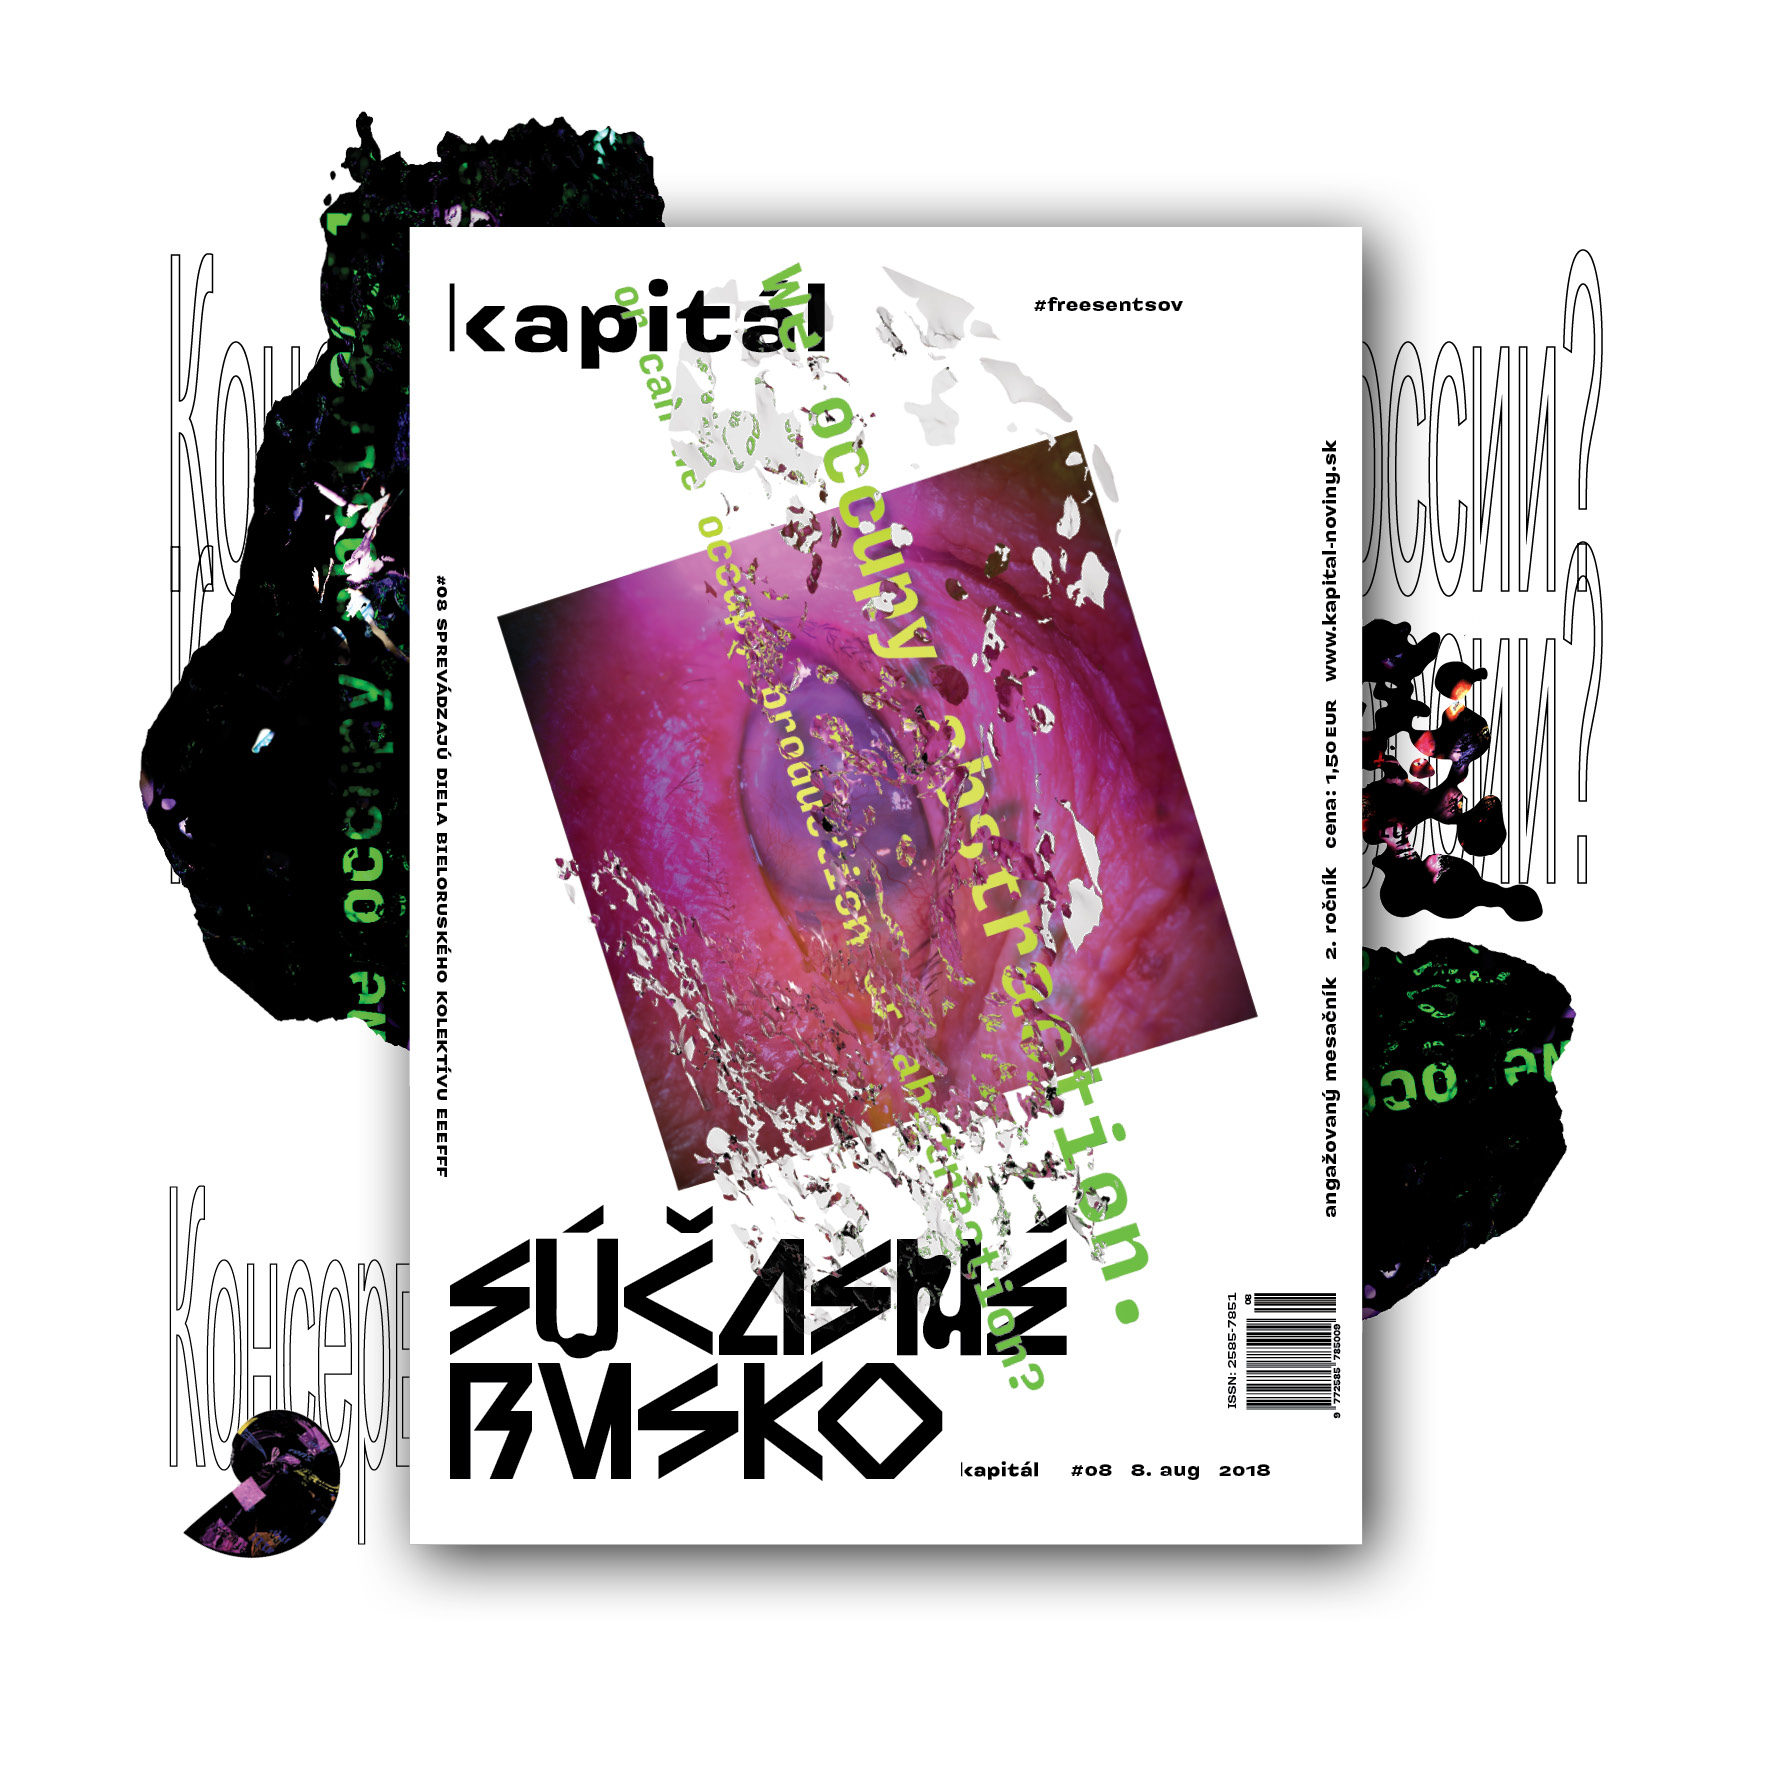 https://kapital-noviny.sk/wp-content/uploads/2018/09/1806_INSTA_KAPITAL-062.jpg